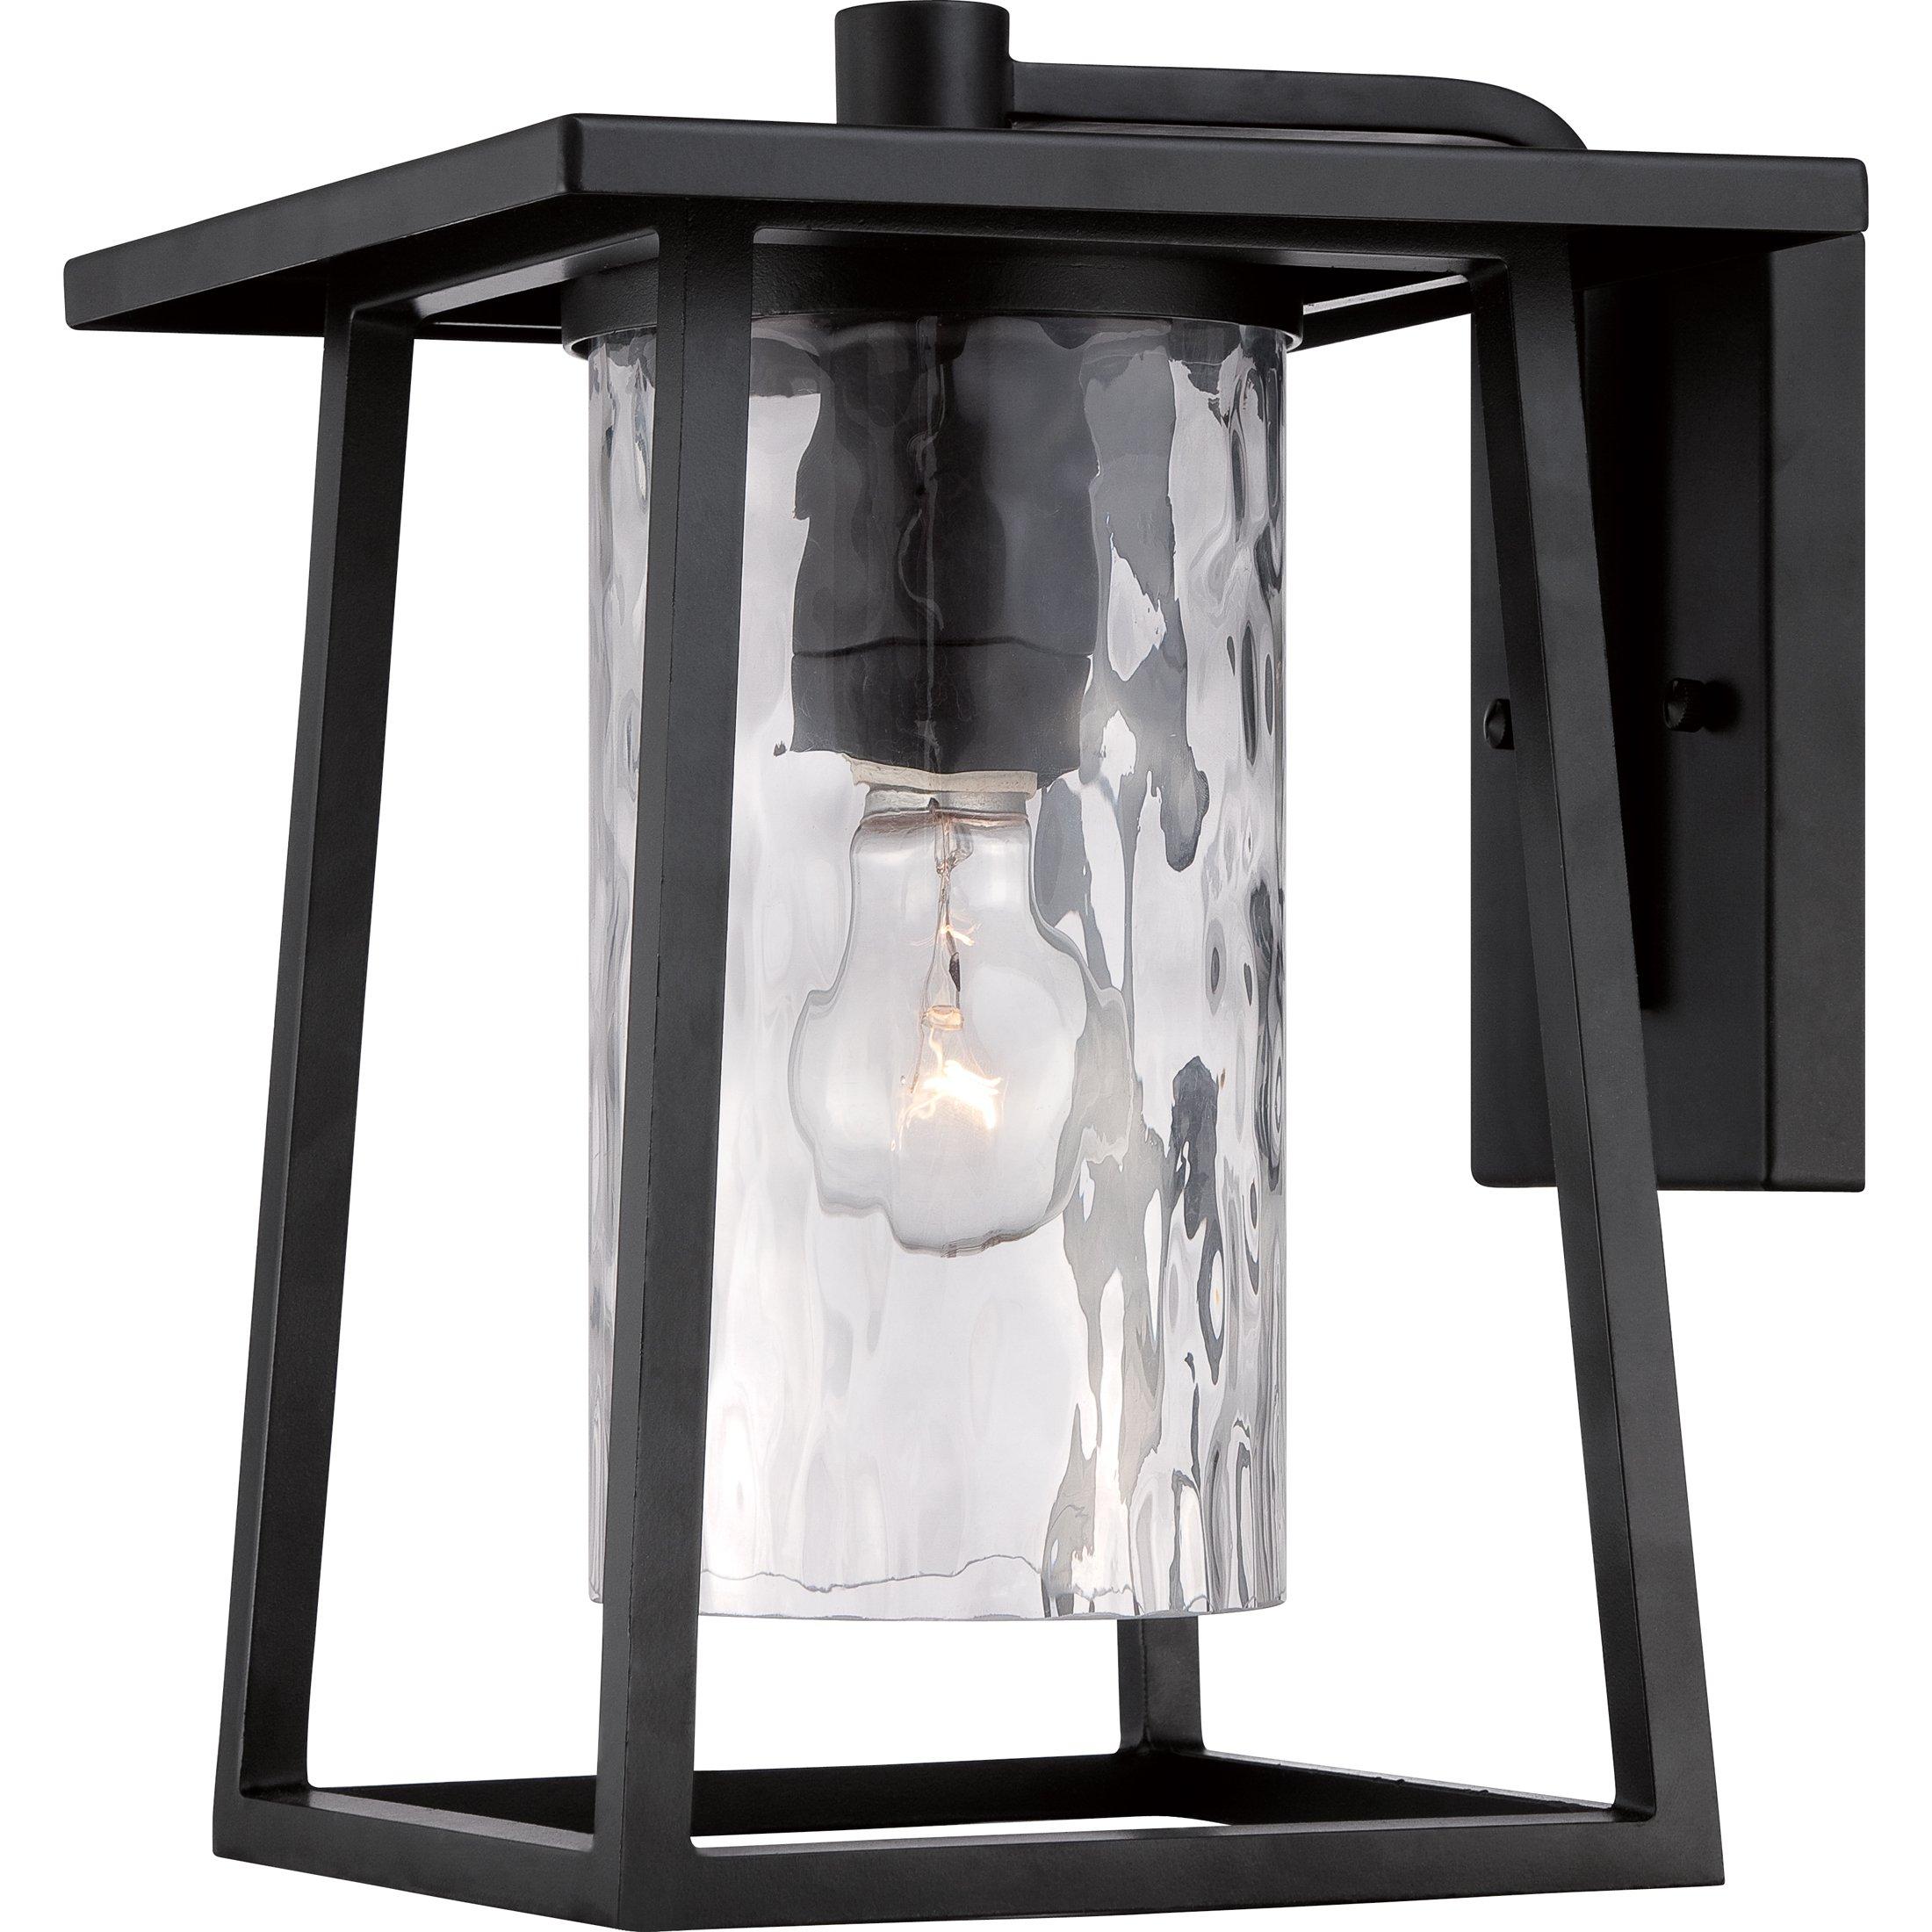 Quoizel LDG8409K Lodge Farmhouse Outdoor Lantern Wall Sconce, 1-Light, 100 Watts, Mystic Black (13'' H x 10'' W)